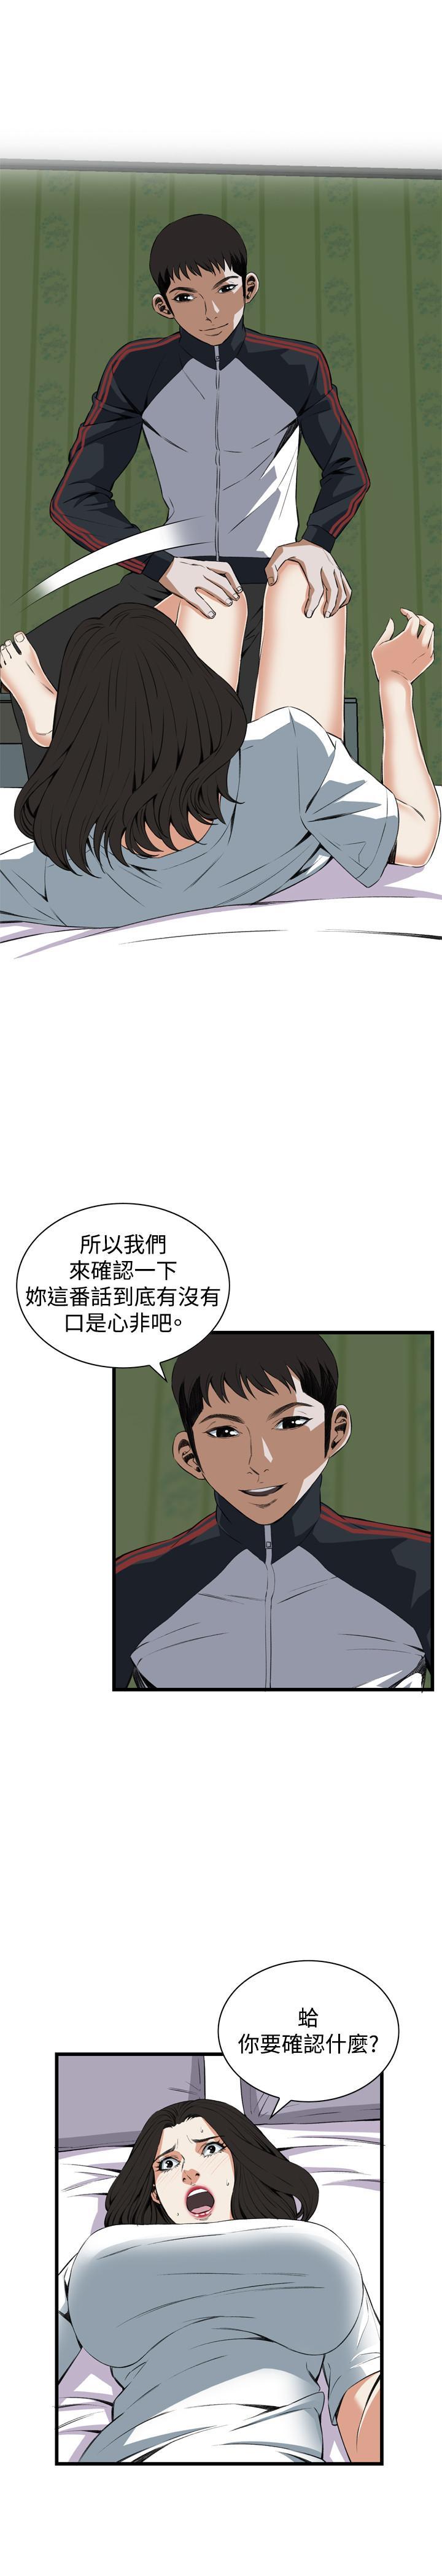 Take a Peek 偷窥 Ch.39~60 [Chinese]中文 667